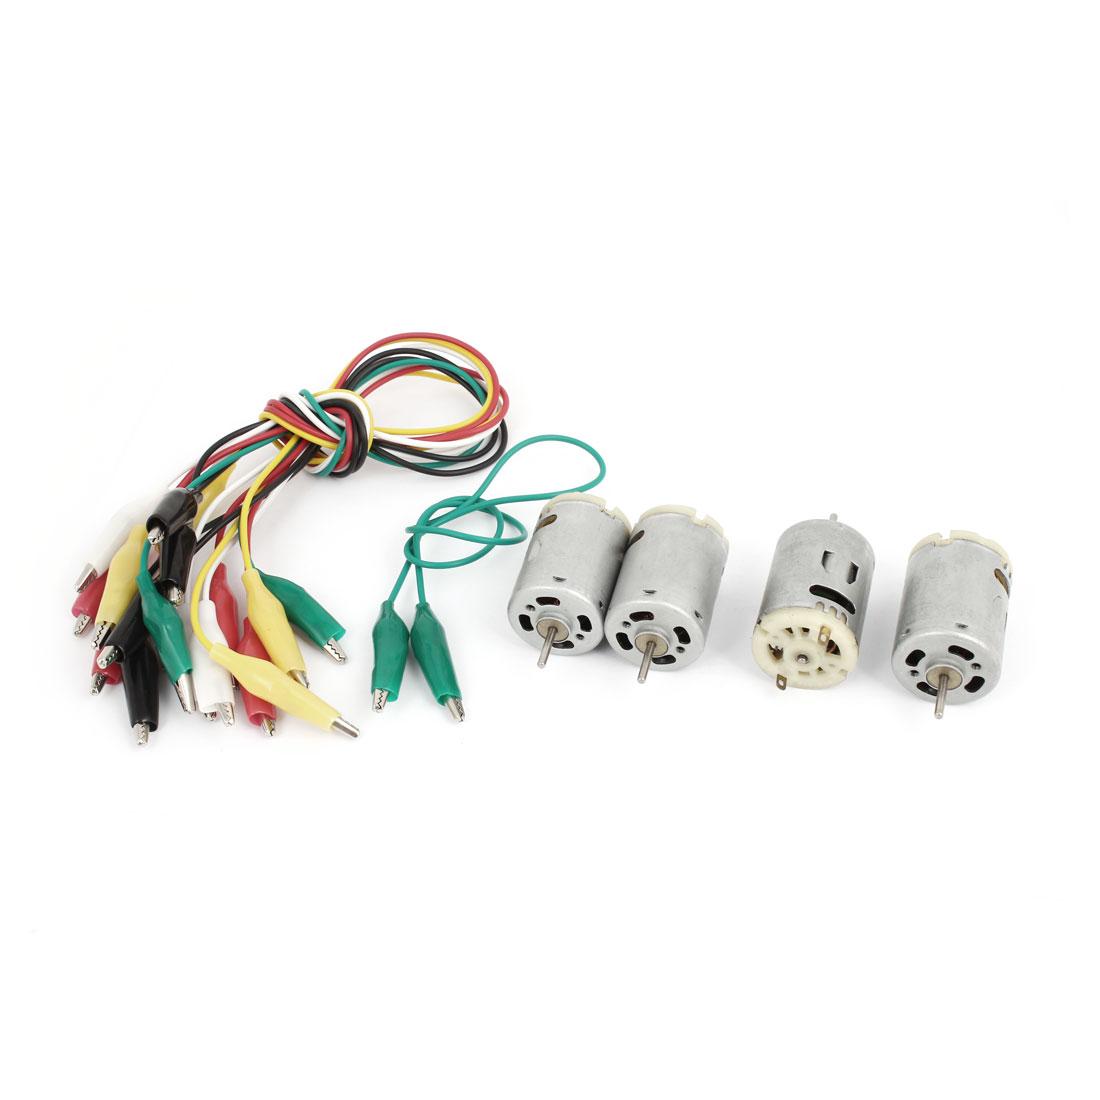 4Pcs High Torque DC 6-12V 9000-15000RPM 2 Terminals Type 380 Mini Motor w Alligator Clip Cable